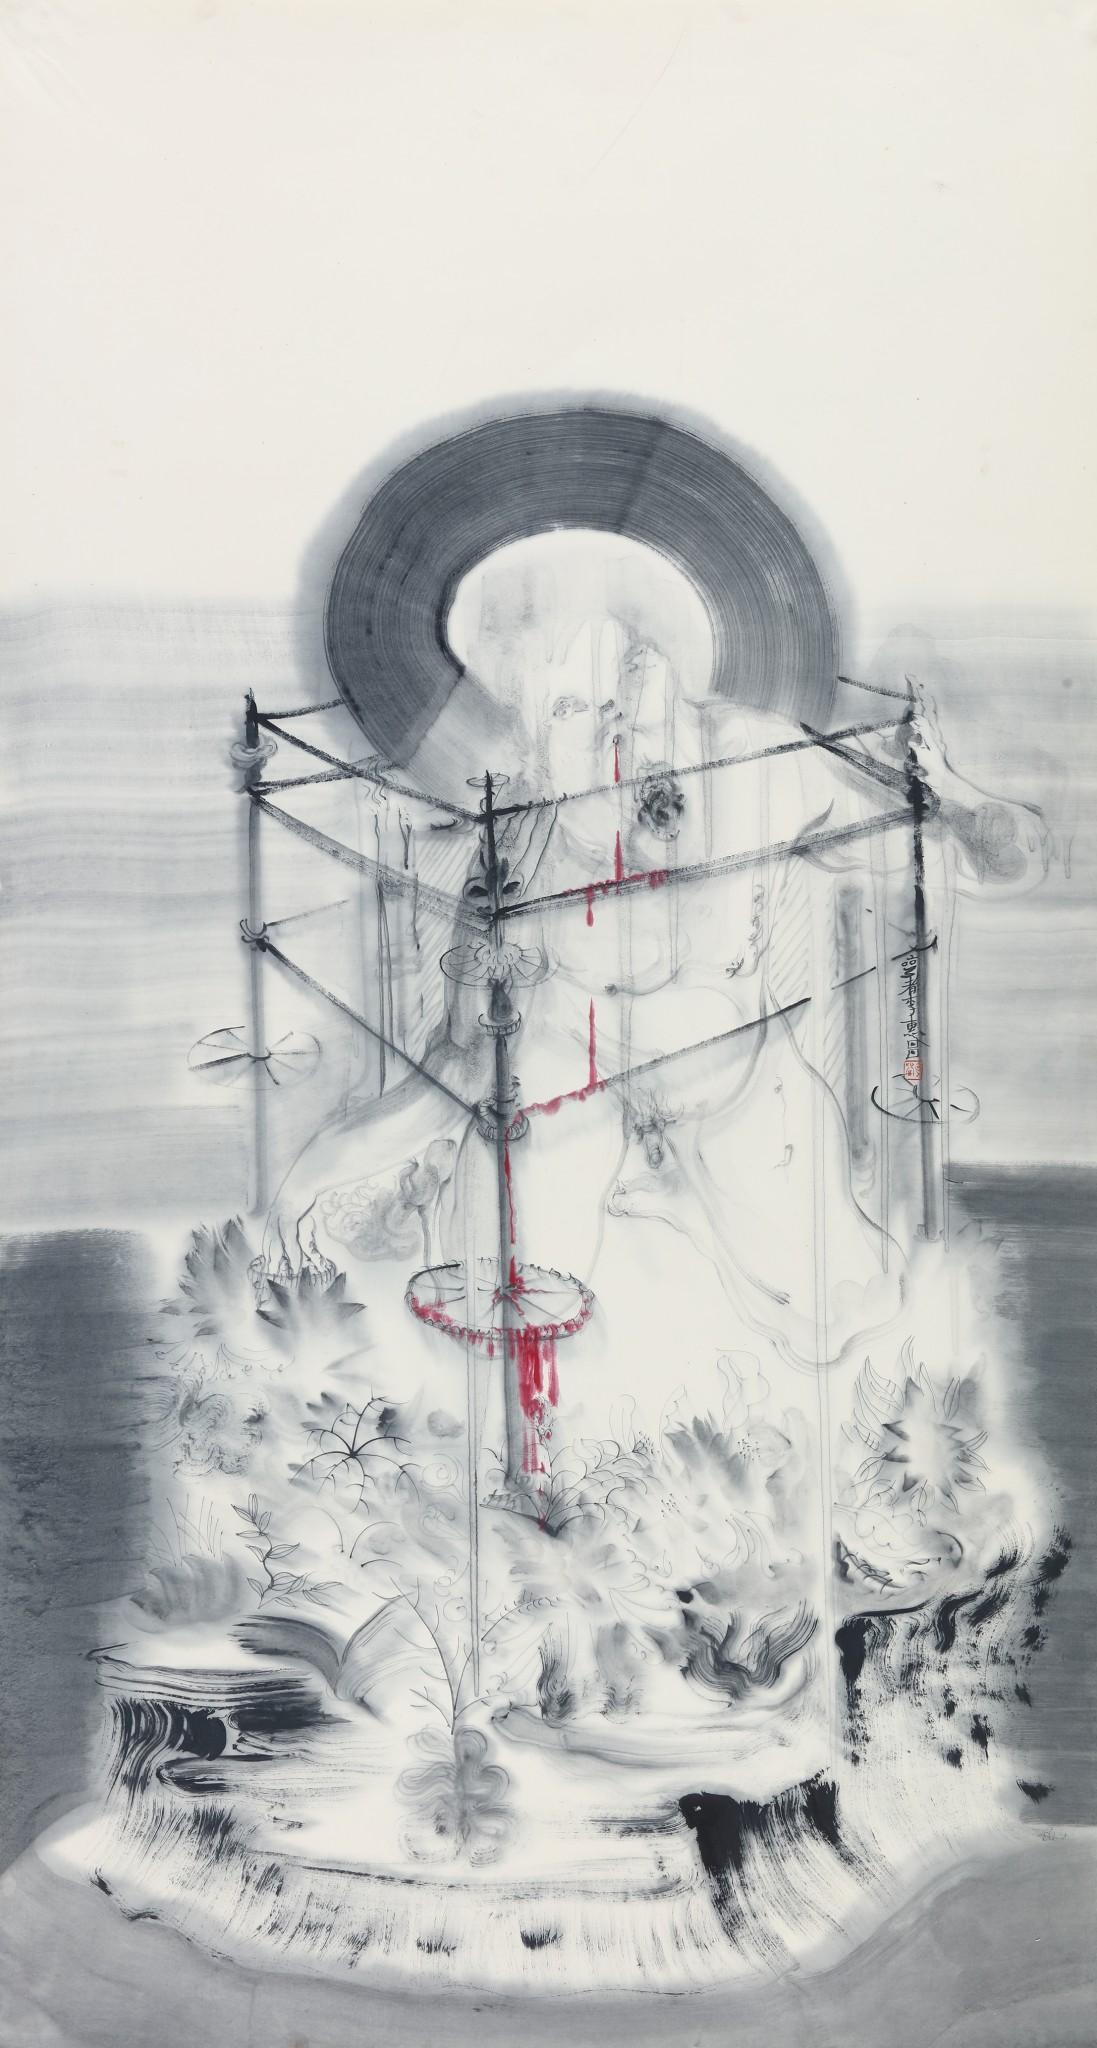 Li Huichang, Grudge series-2, ink on rice paper, 36_ x70_